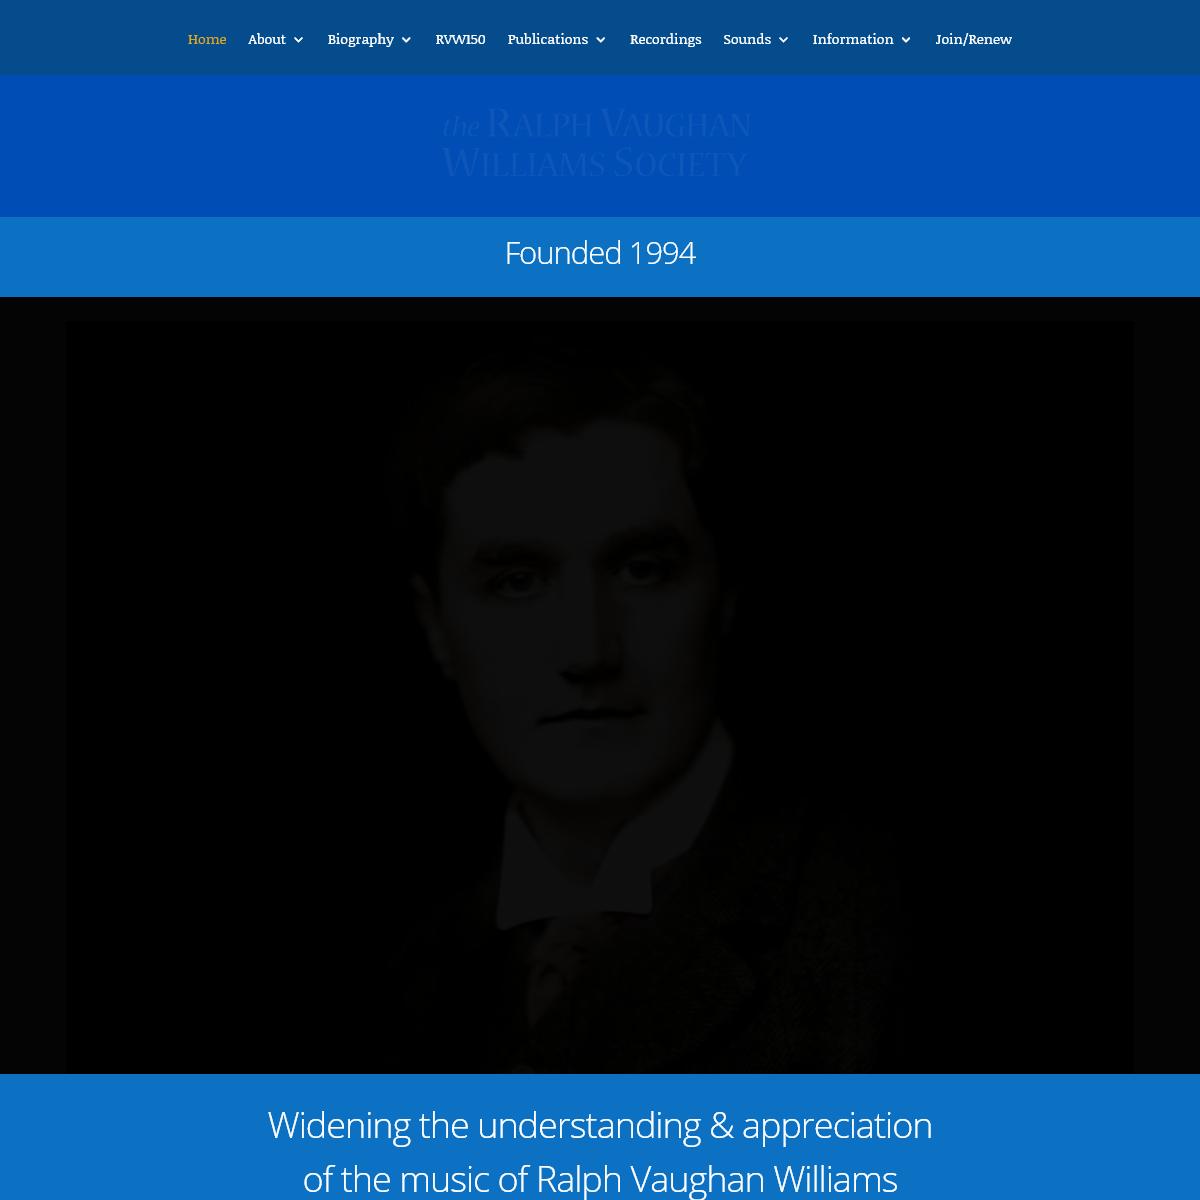 Ralph Vaughan Williams Society - Ralph Vaughan Williams Society